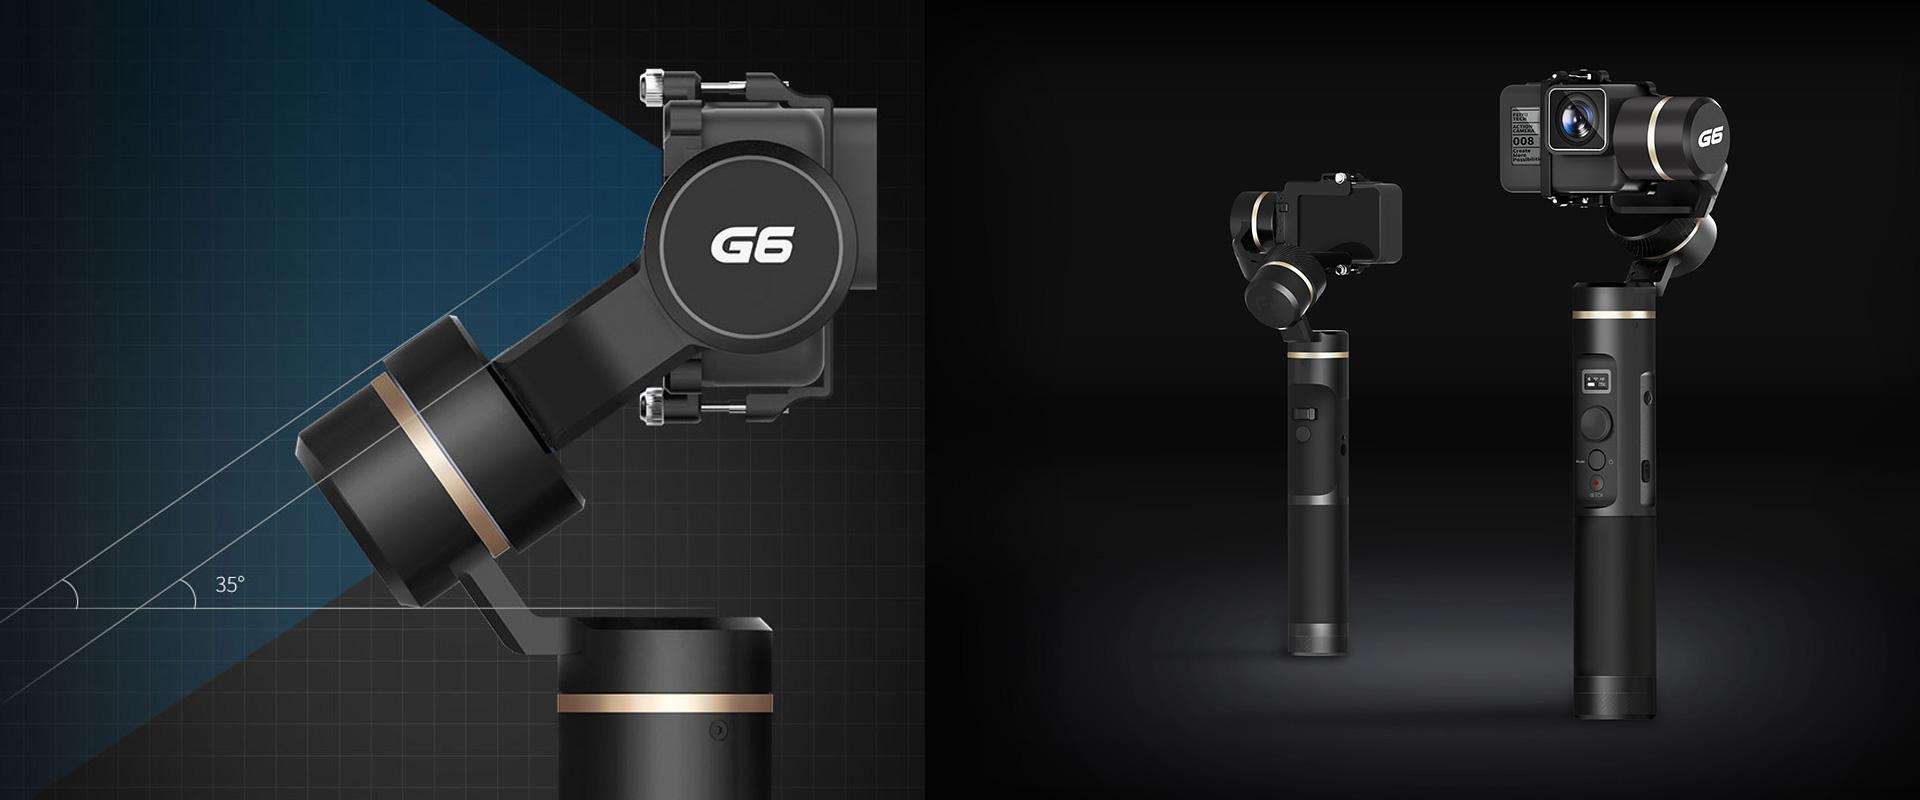 Feiyu G6 - 3-axis, splash-proof gimbal - GoPro Hero6 black, GoPro Hero5 black